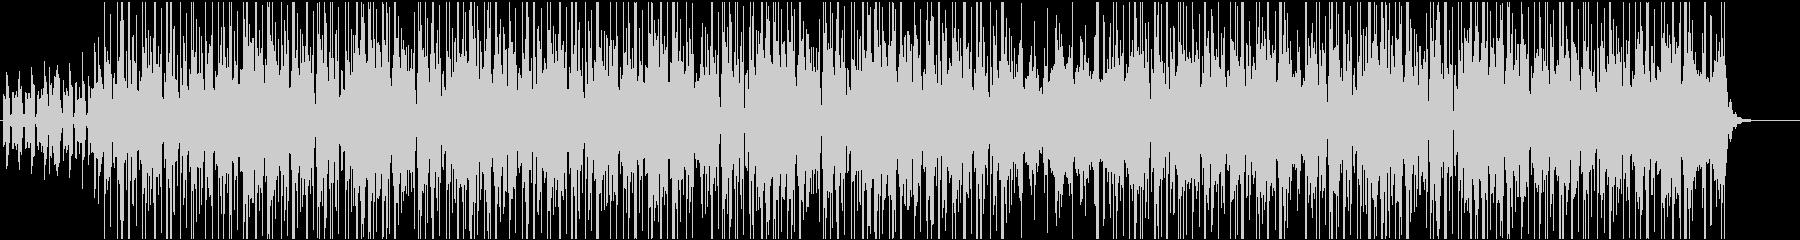 JazzyなインストヒップホップBGMの未再生の波形